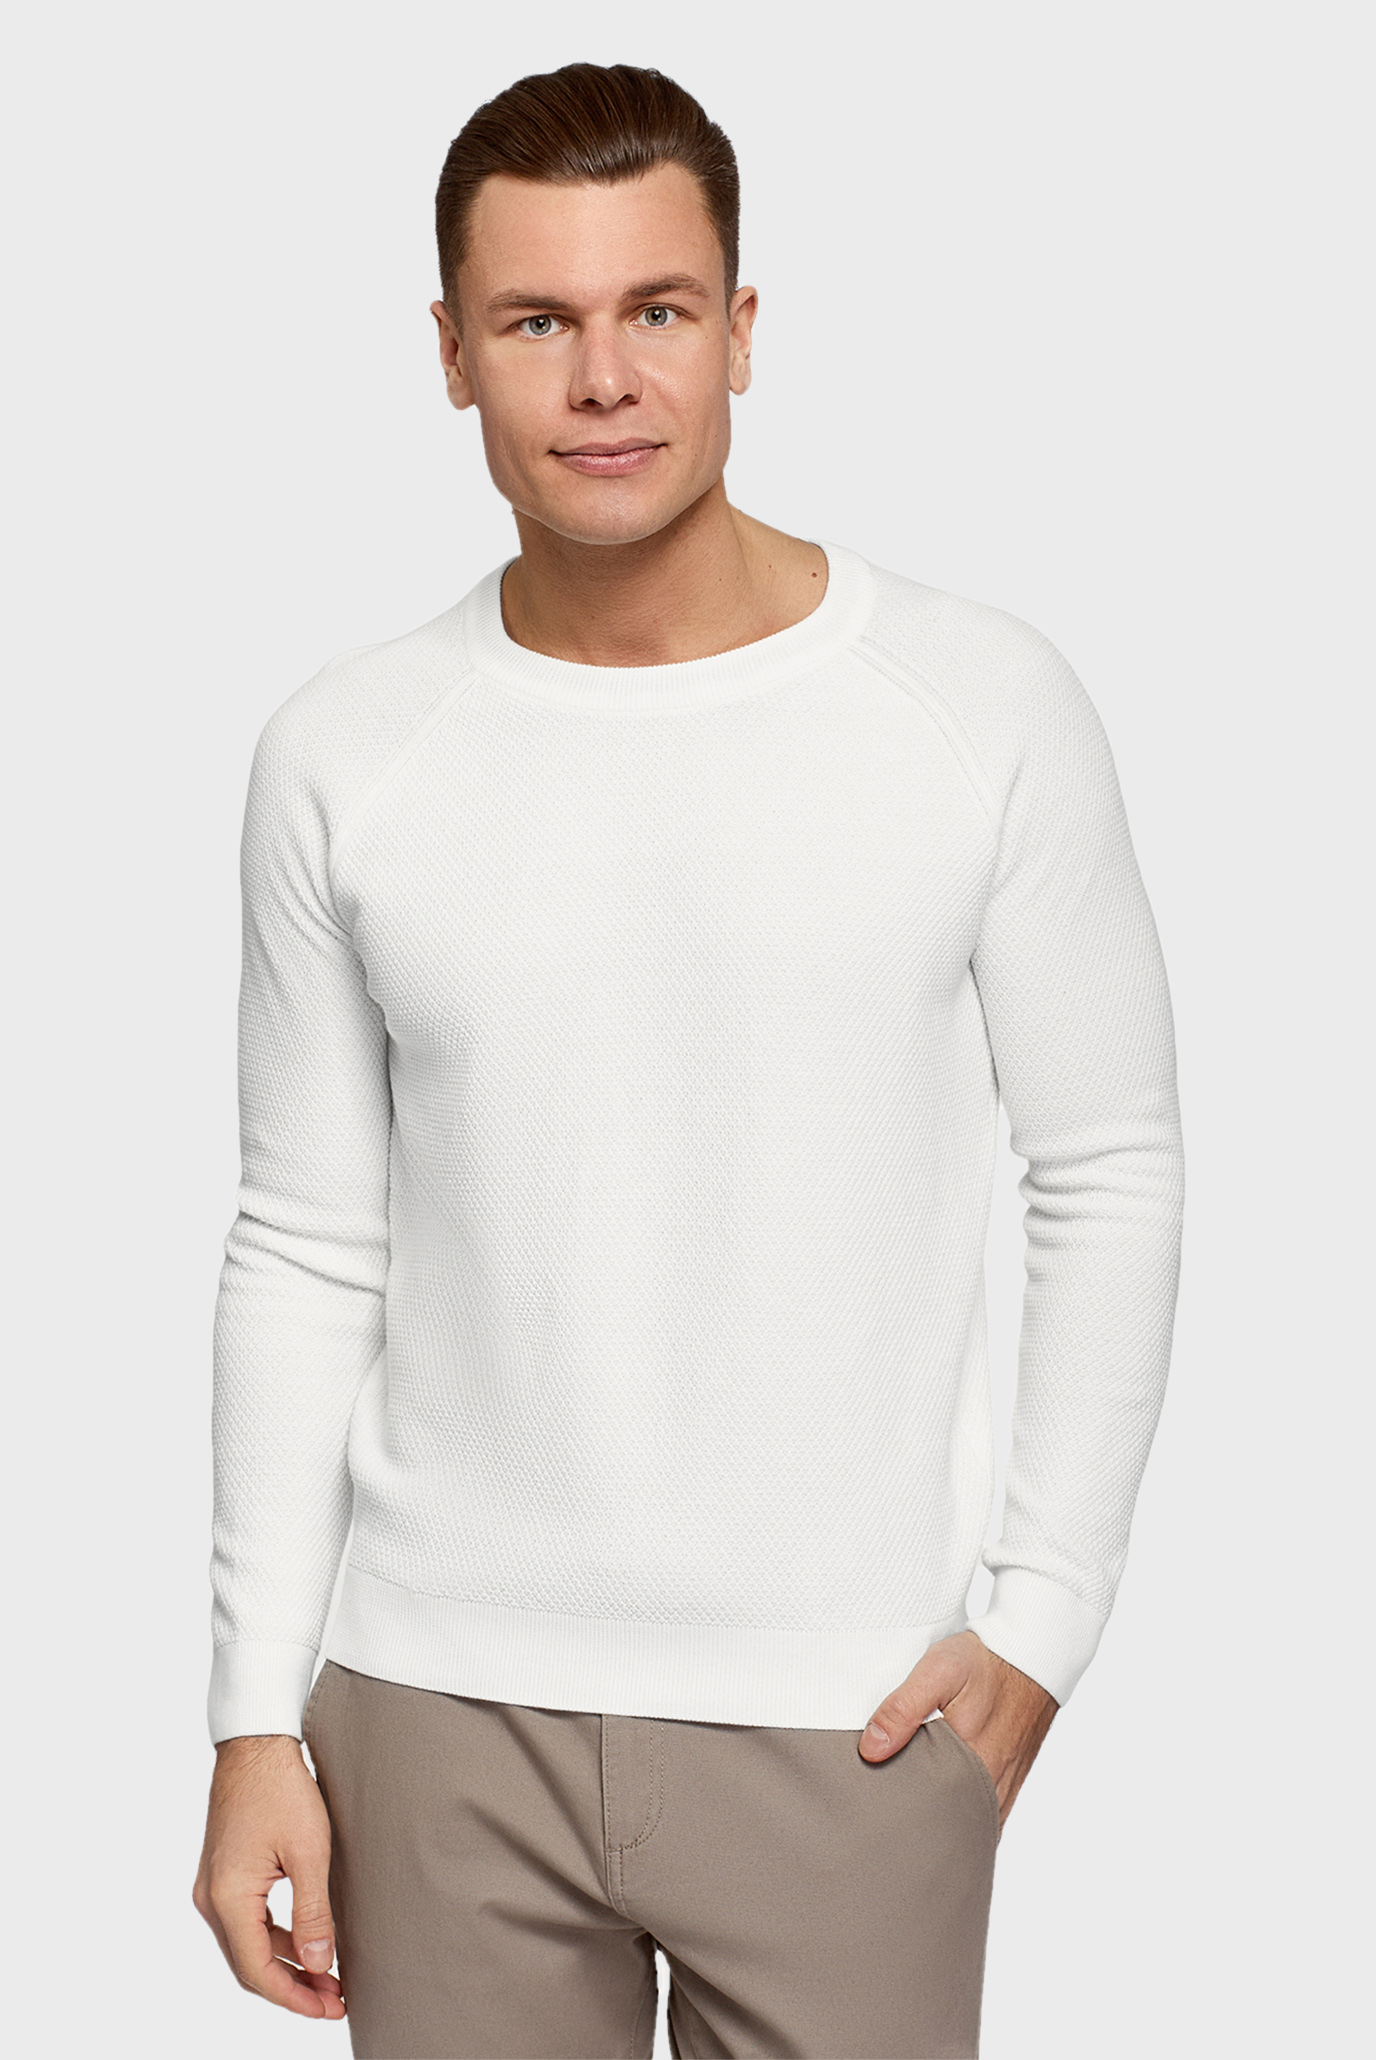 Мужской белый джемпер 1